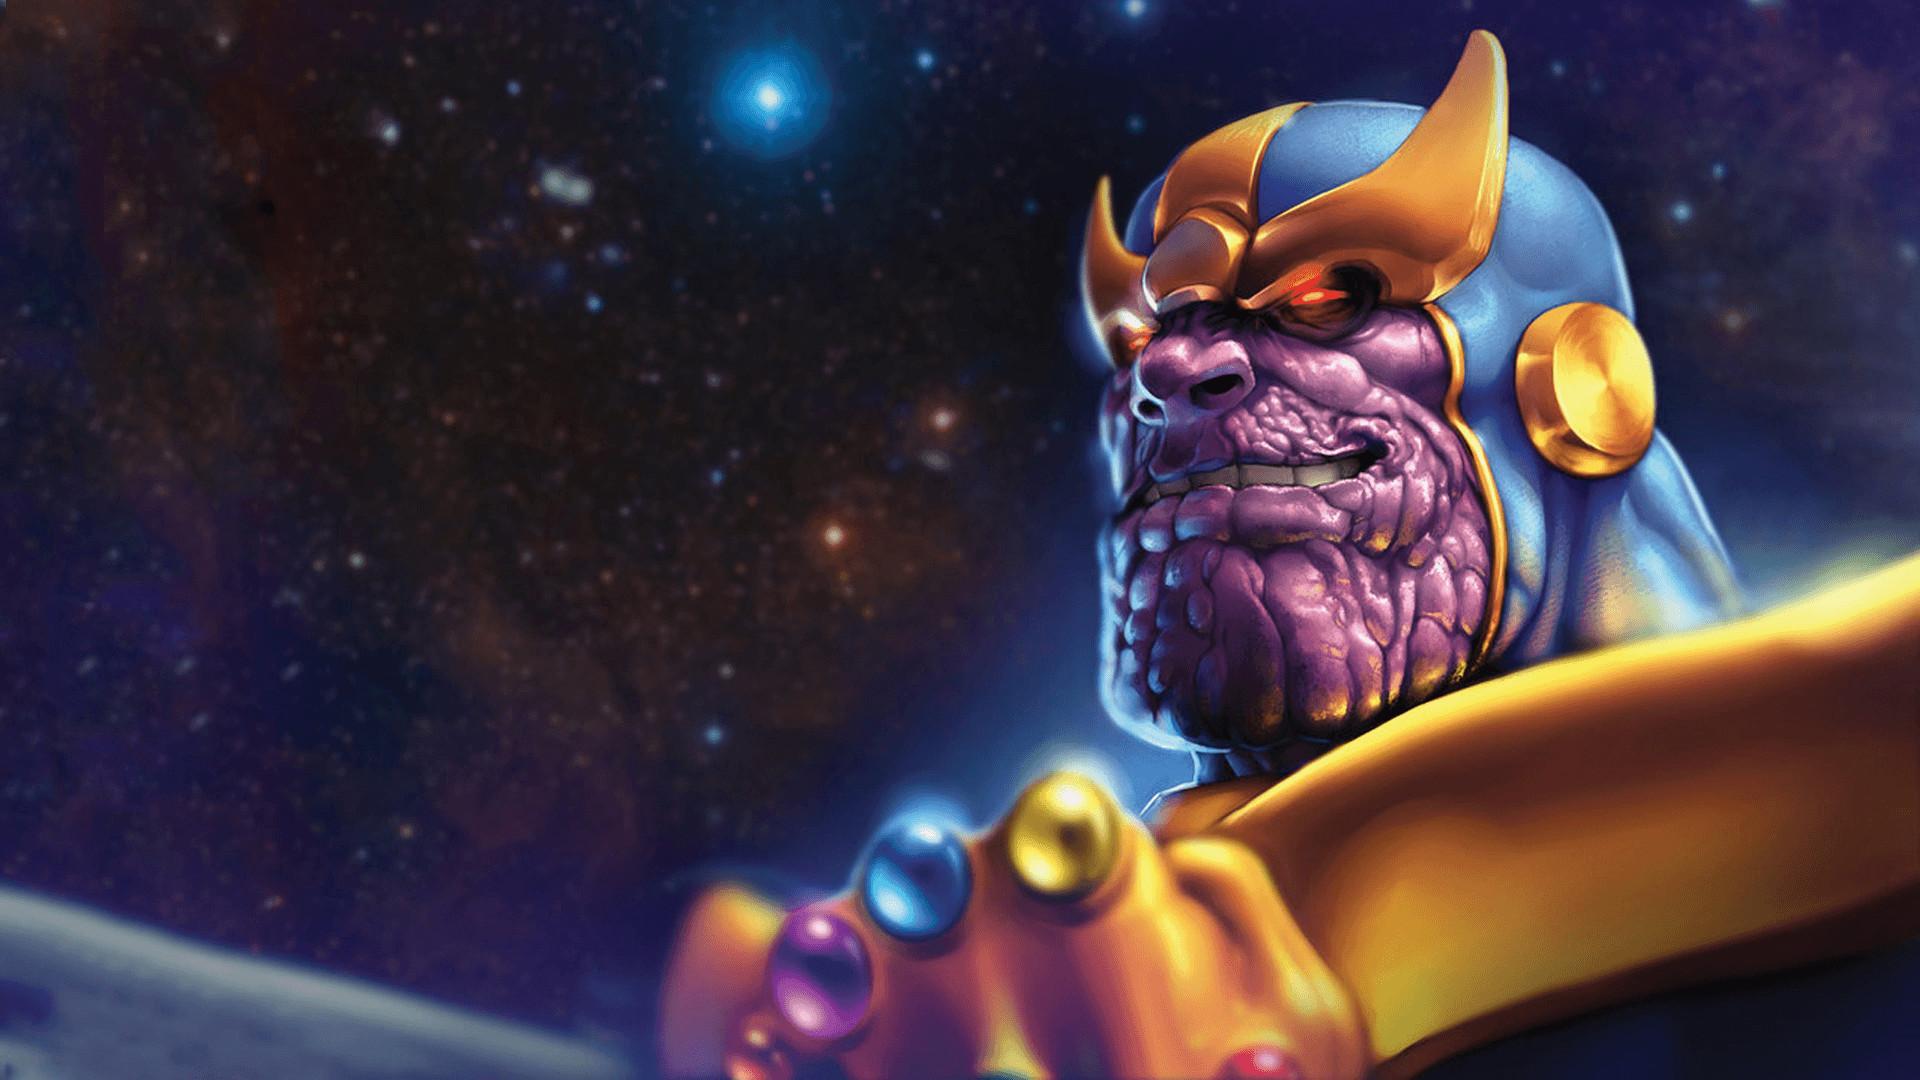 Thanos Wallpaper HD – WallpaperSafari